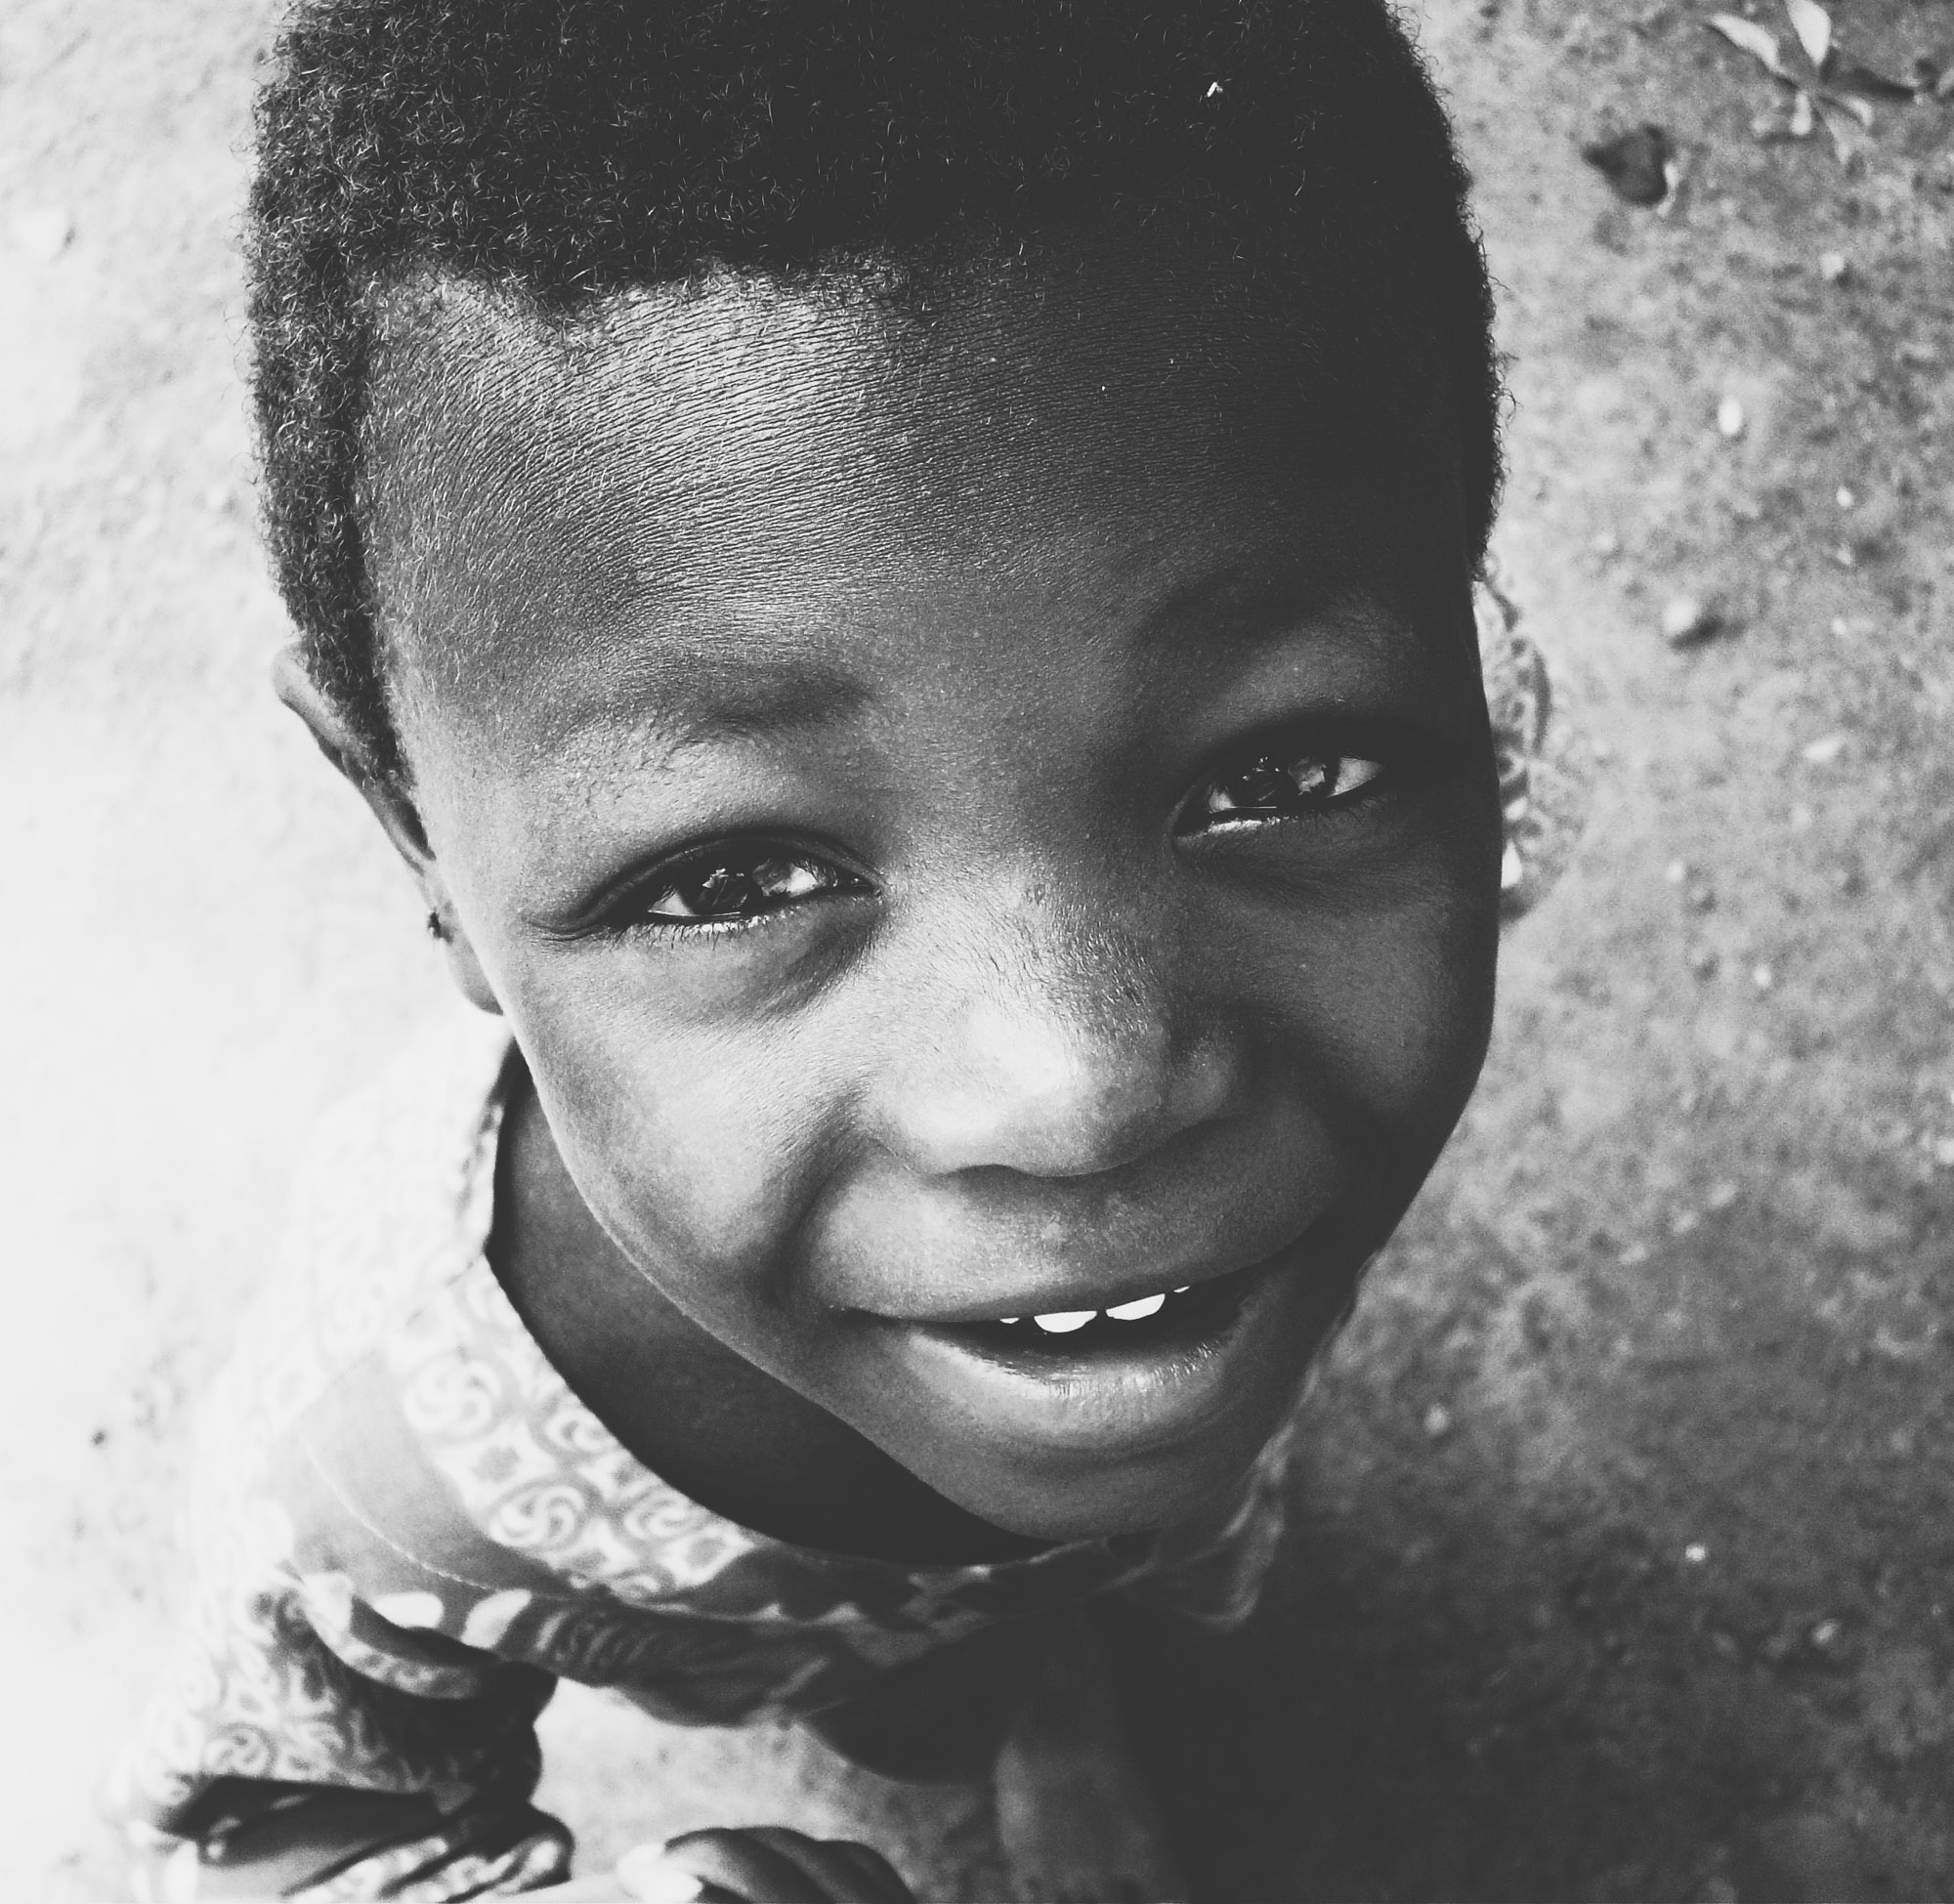 A smiling child in Cape Coast, Ghana | Photo by Caroline Taft,  The Brazen Gourmand